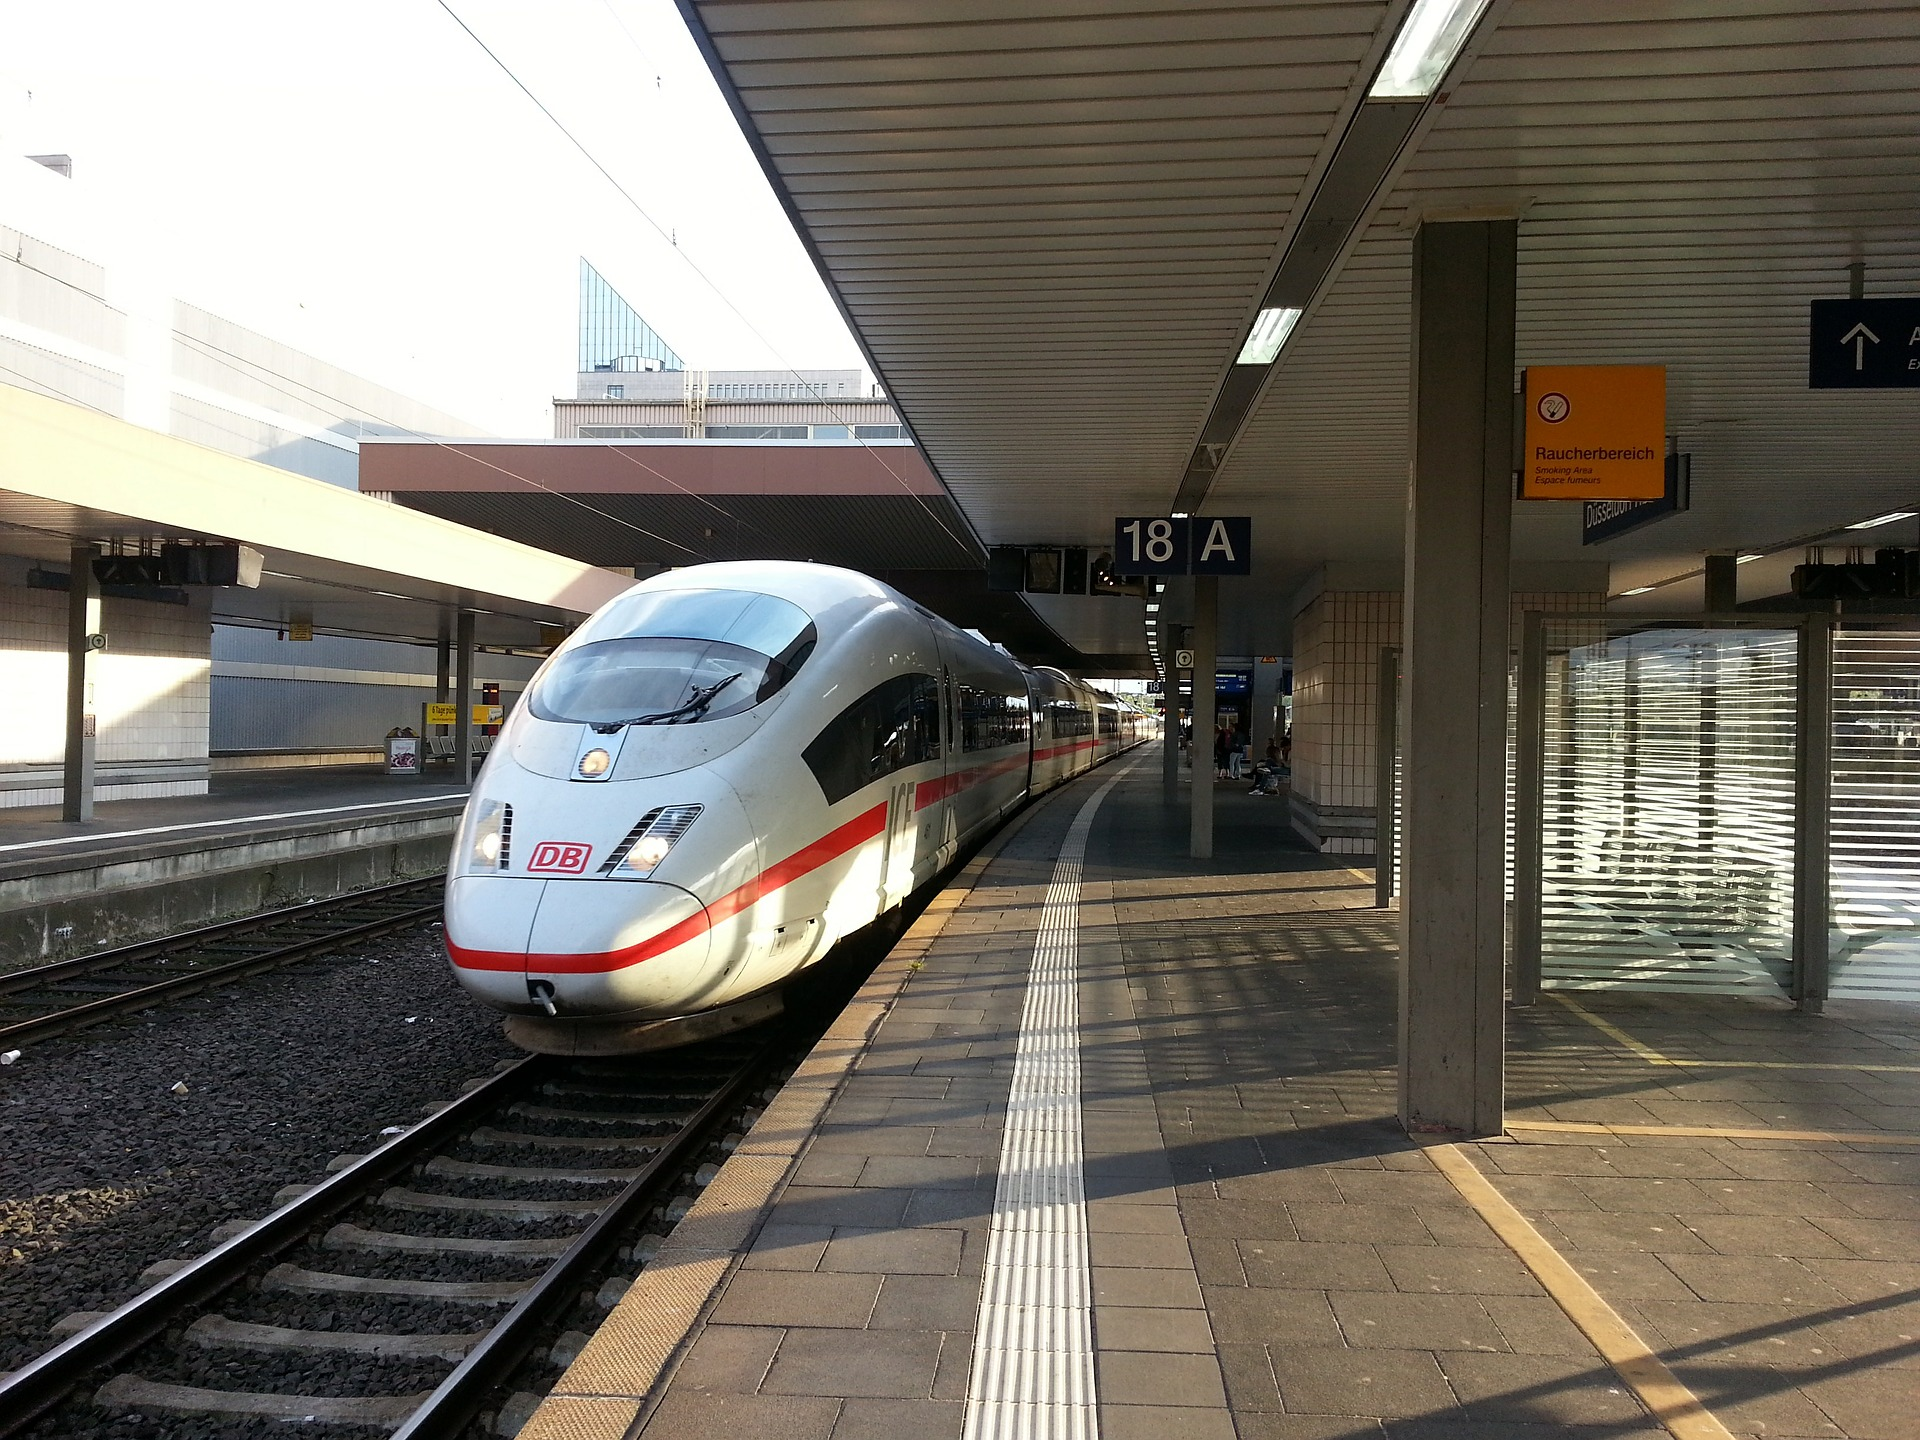 Düsseldorf Hauptbahnhof ICE Streckennetz- Amsterdam , Hamburg , Frankfurt, Stuttgart usw..